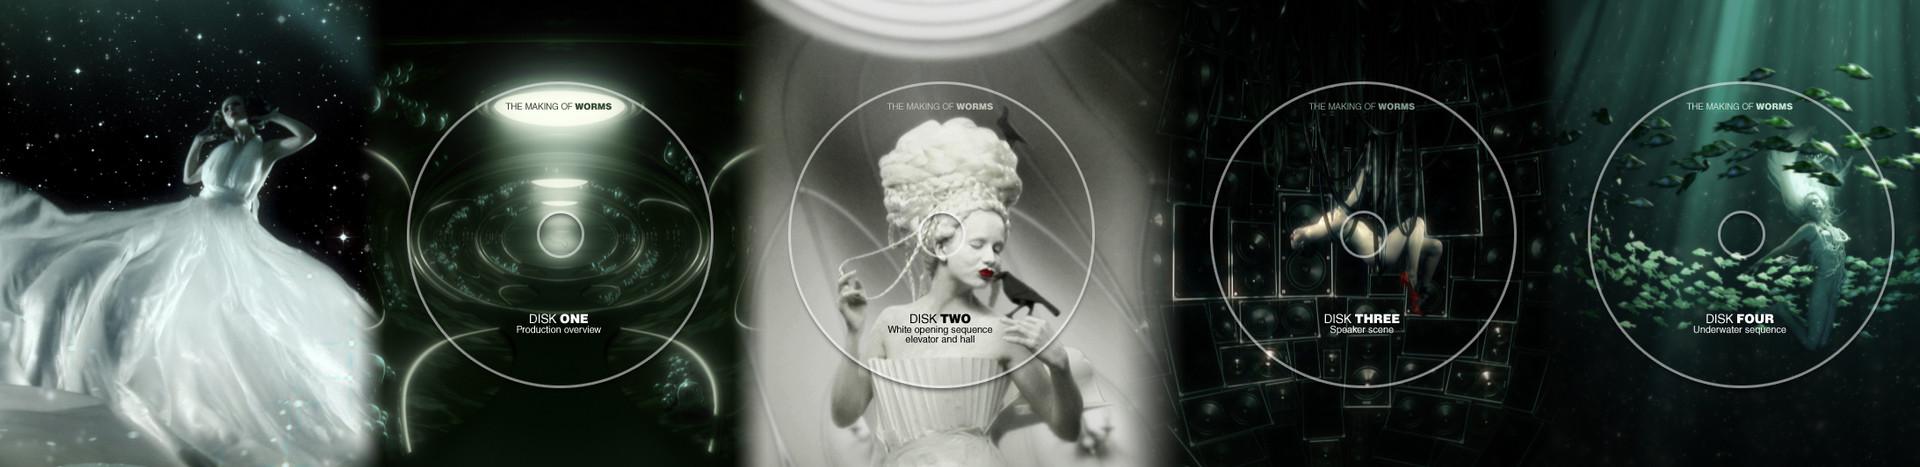 Lolly Jane Blue - Worms - Gnomon workshop DVD